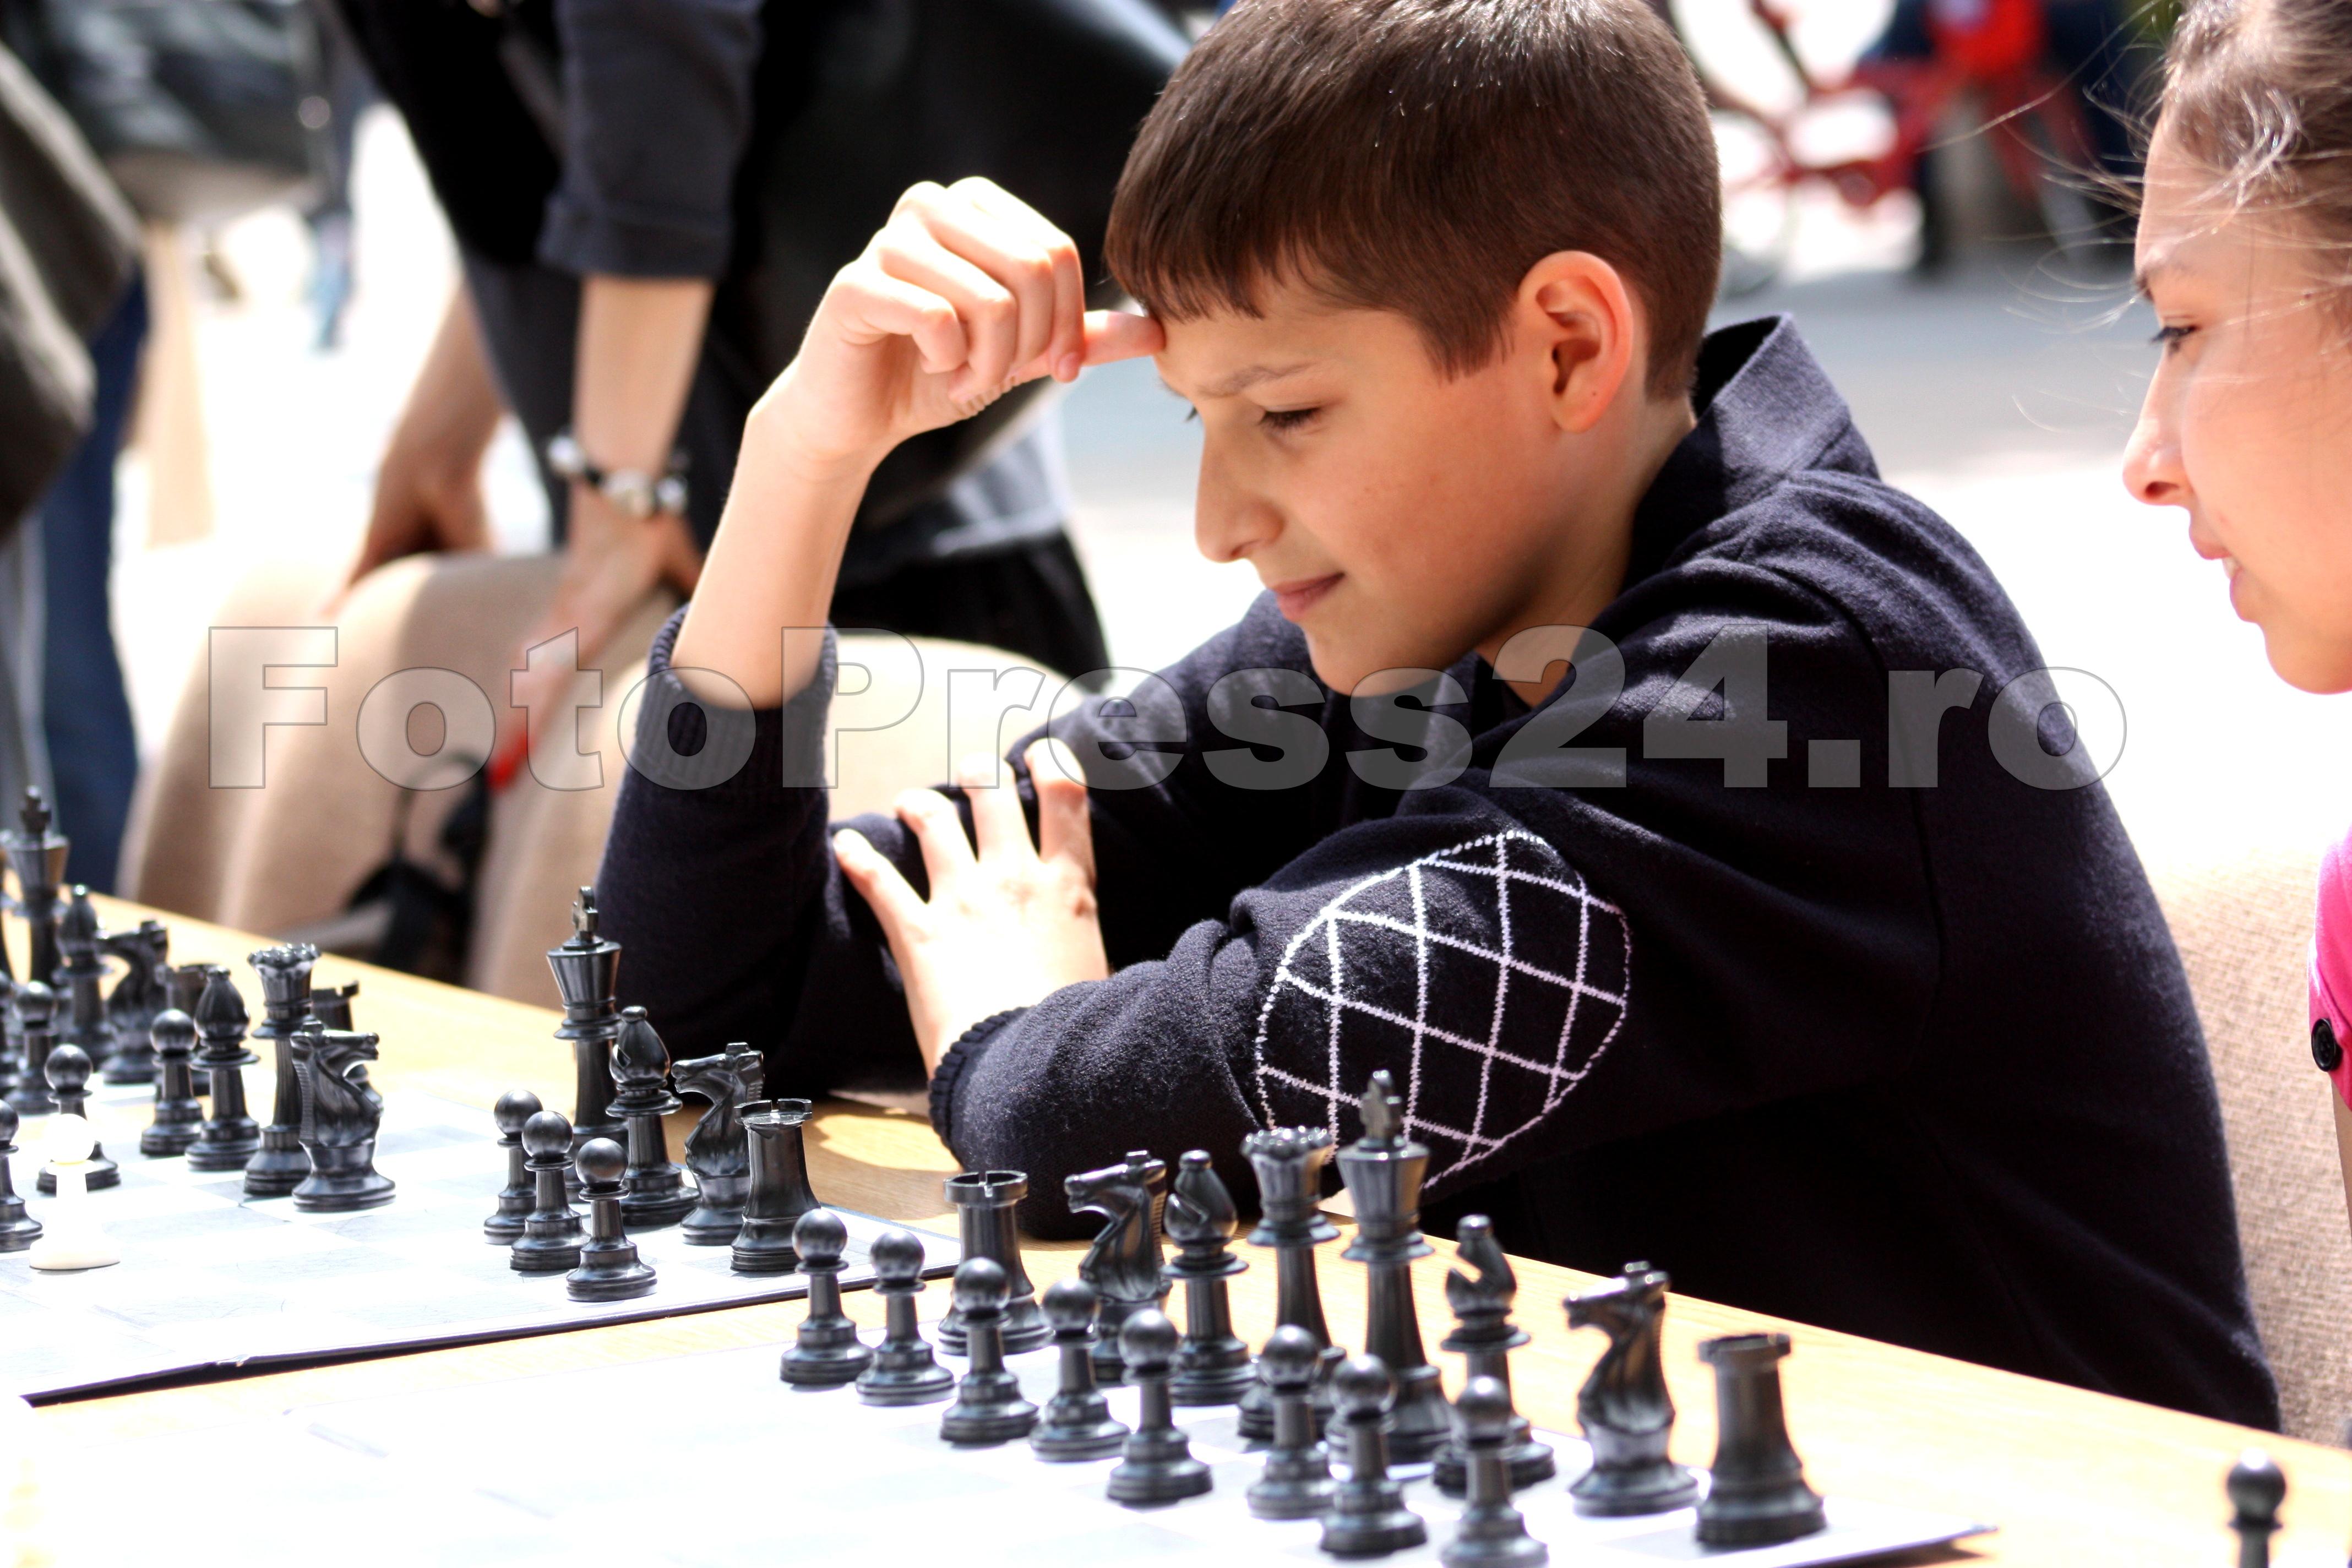 Sah-foto-Mihai Neacsu (4)